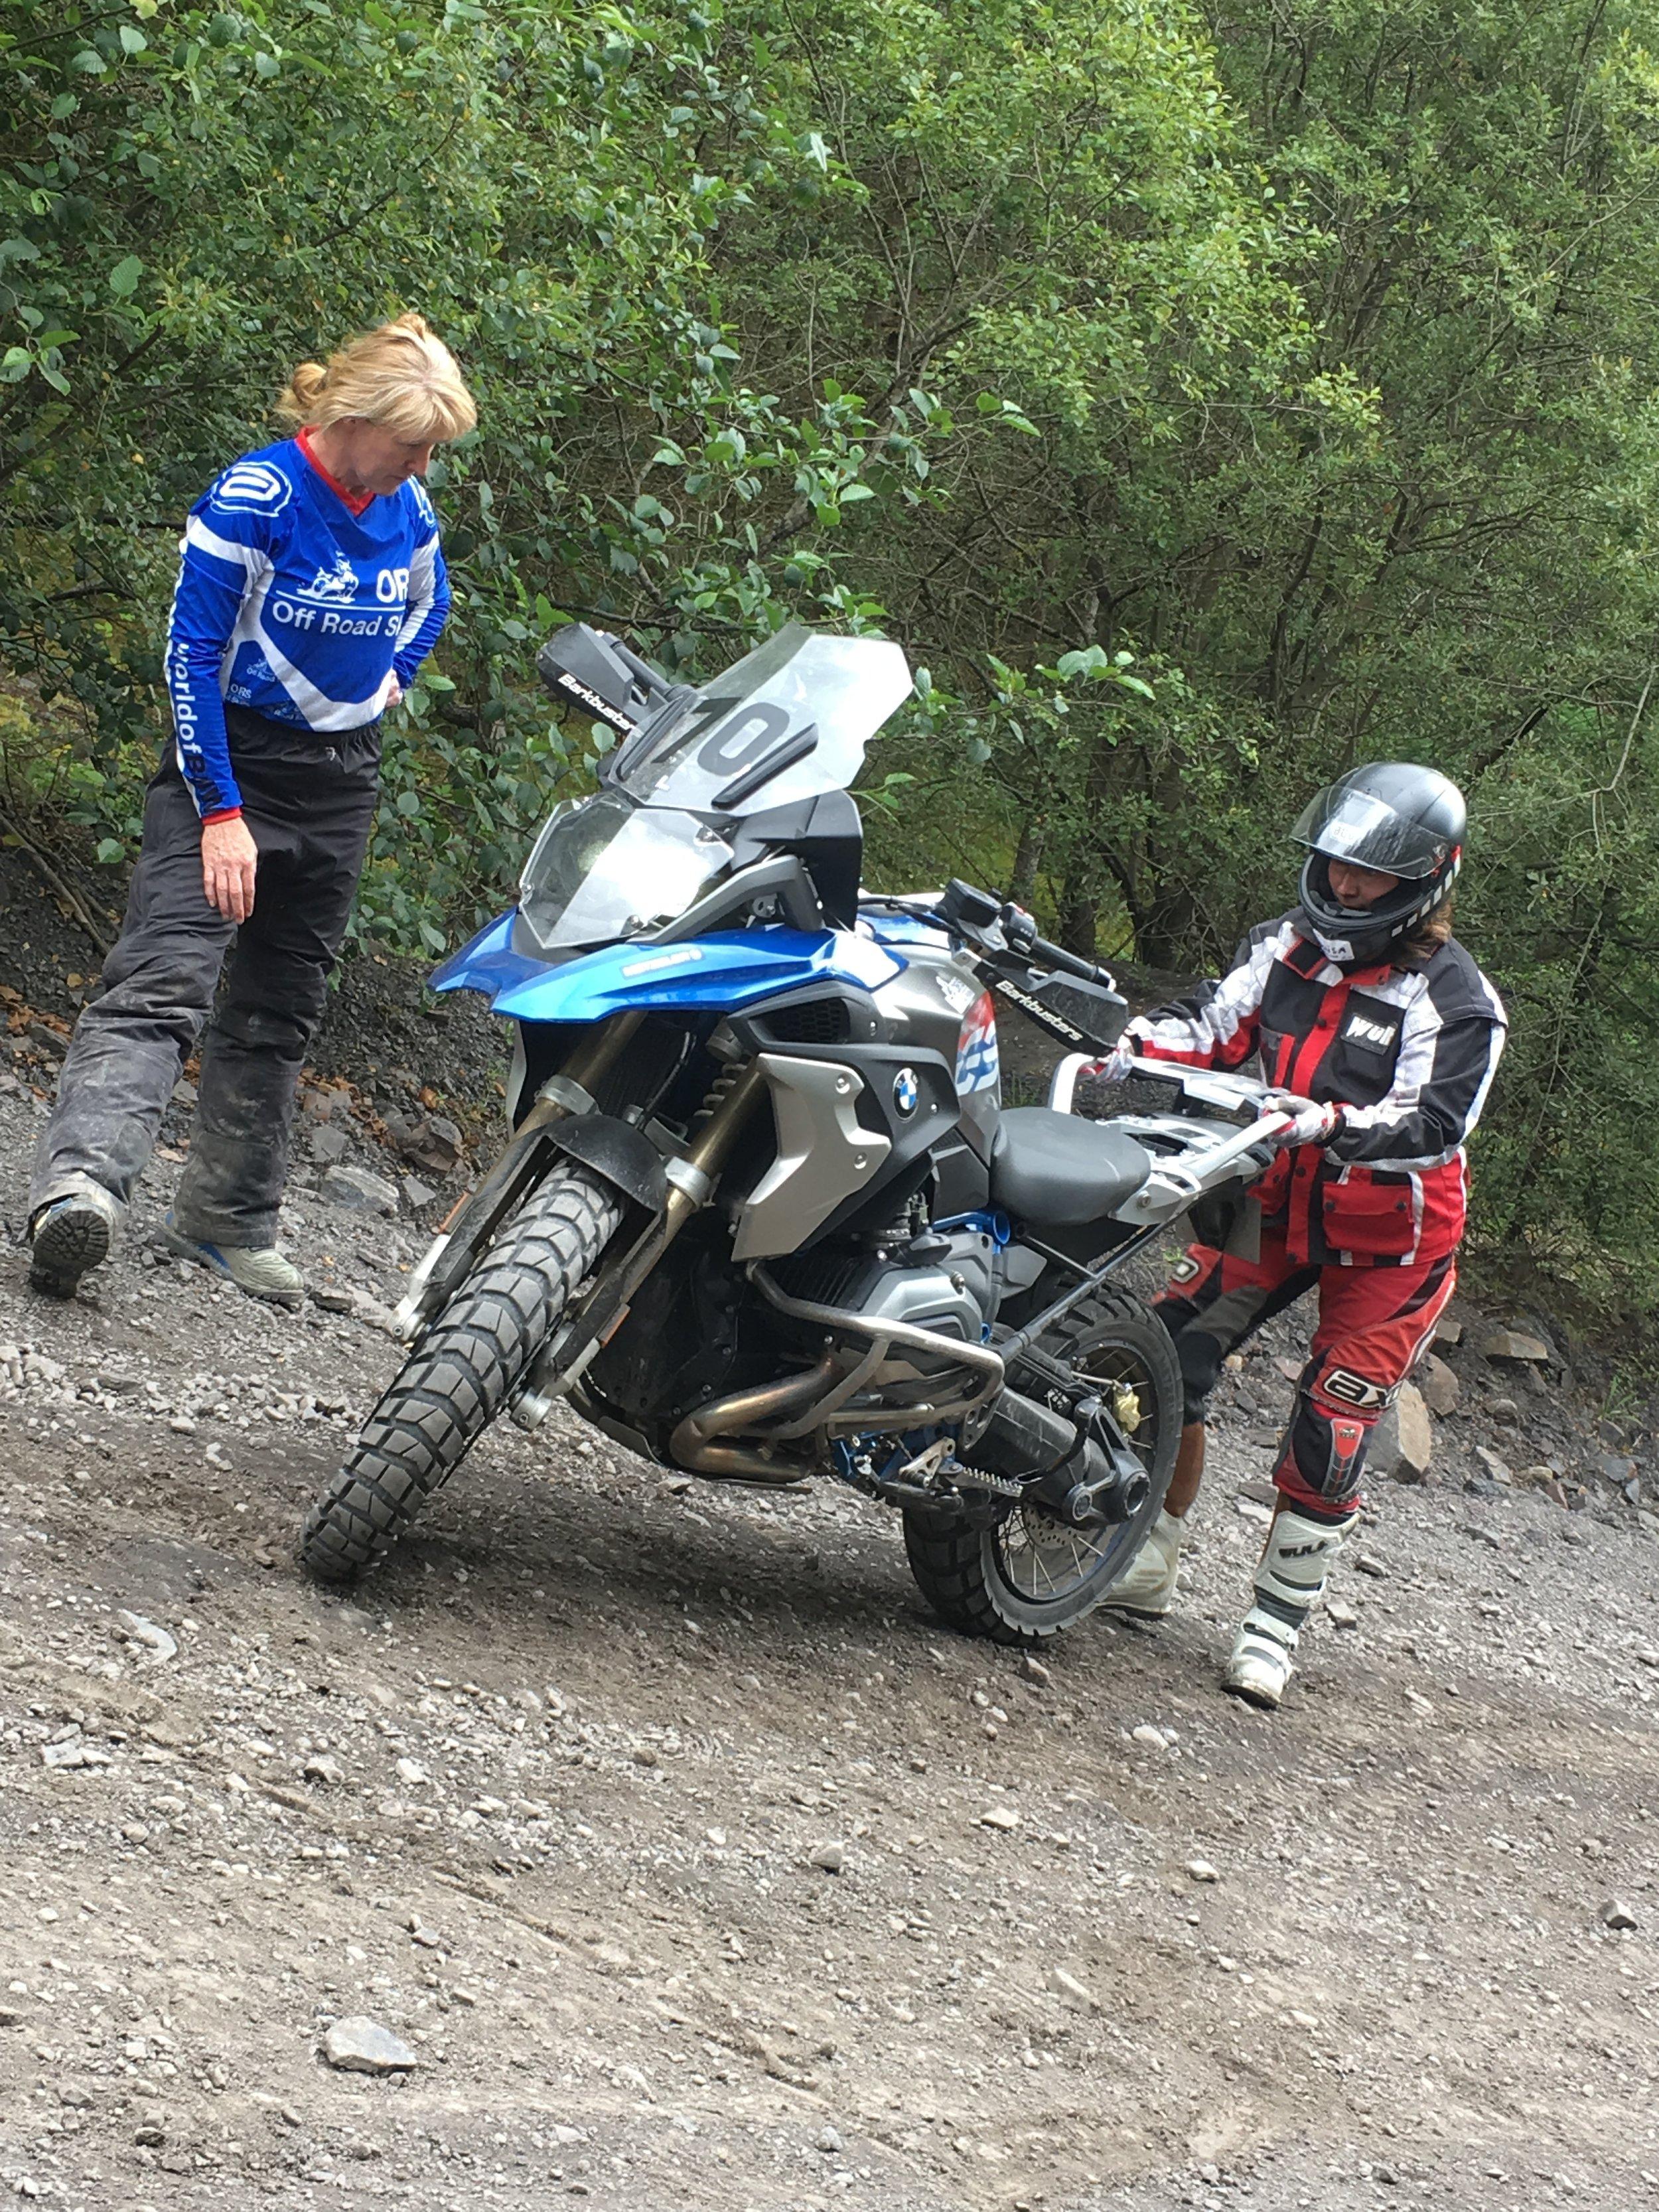 Louisa-Swaden-Adventure-Rider-Radio-Motorcycle-Podcast-11.jpg